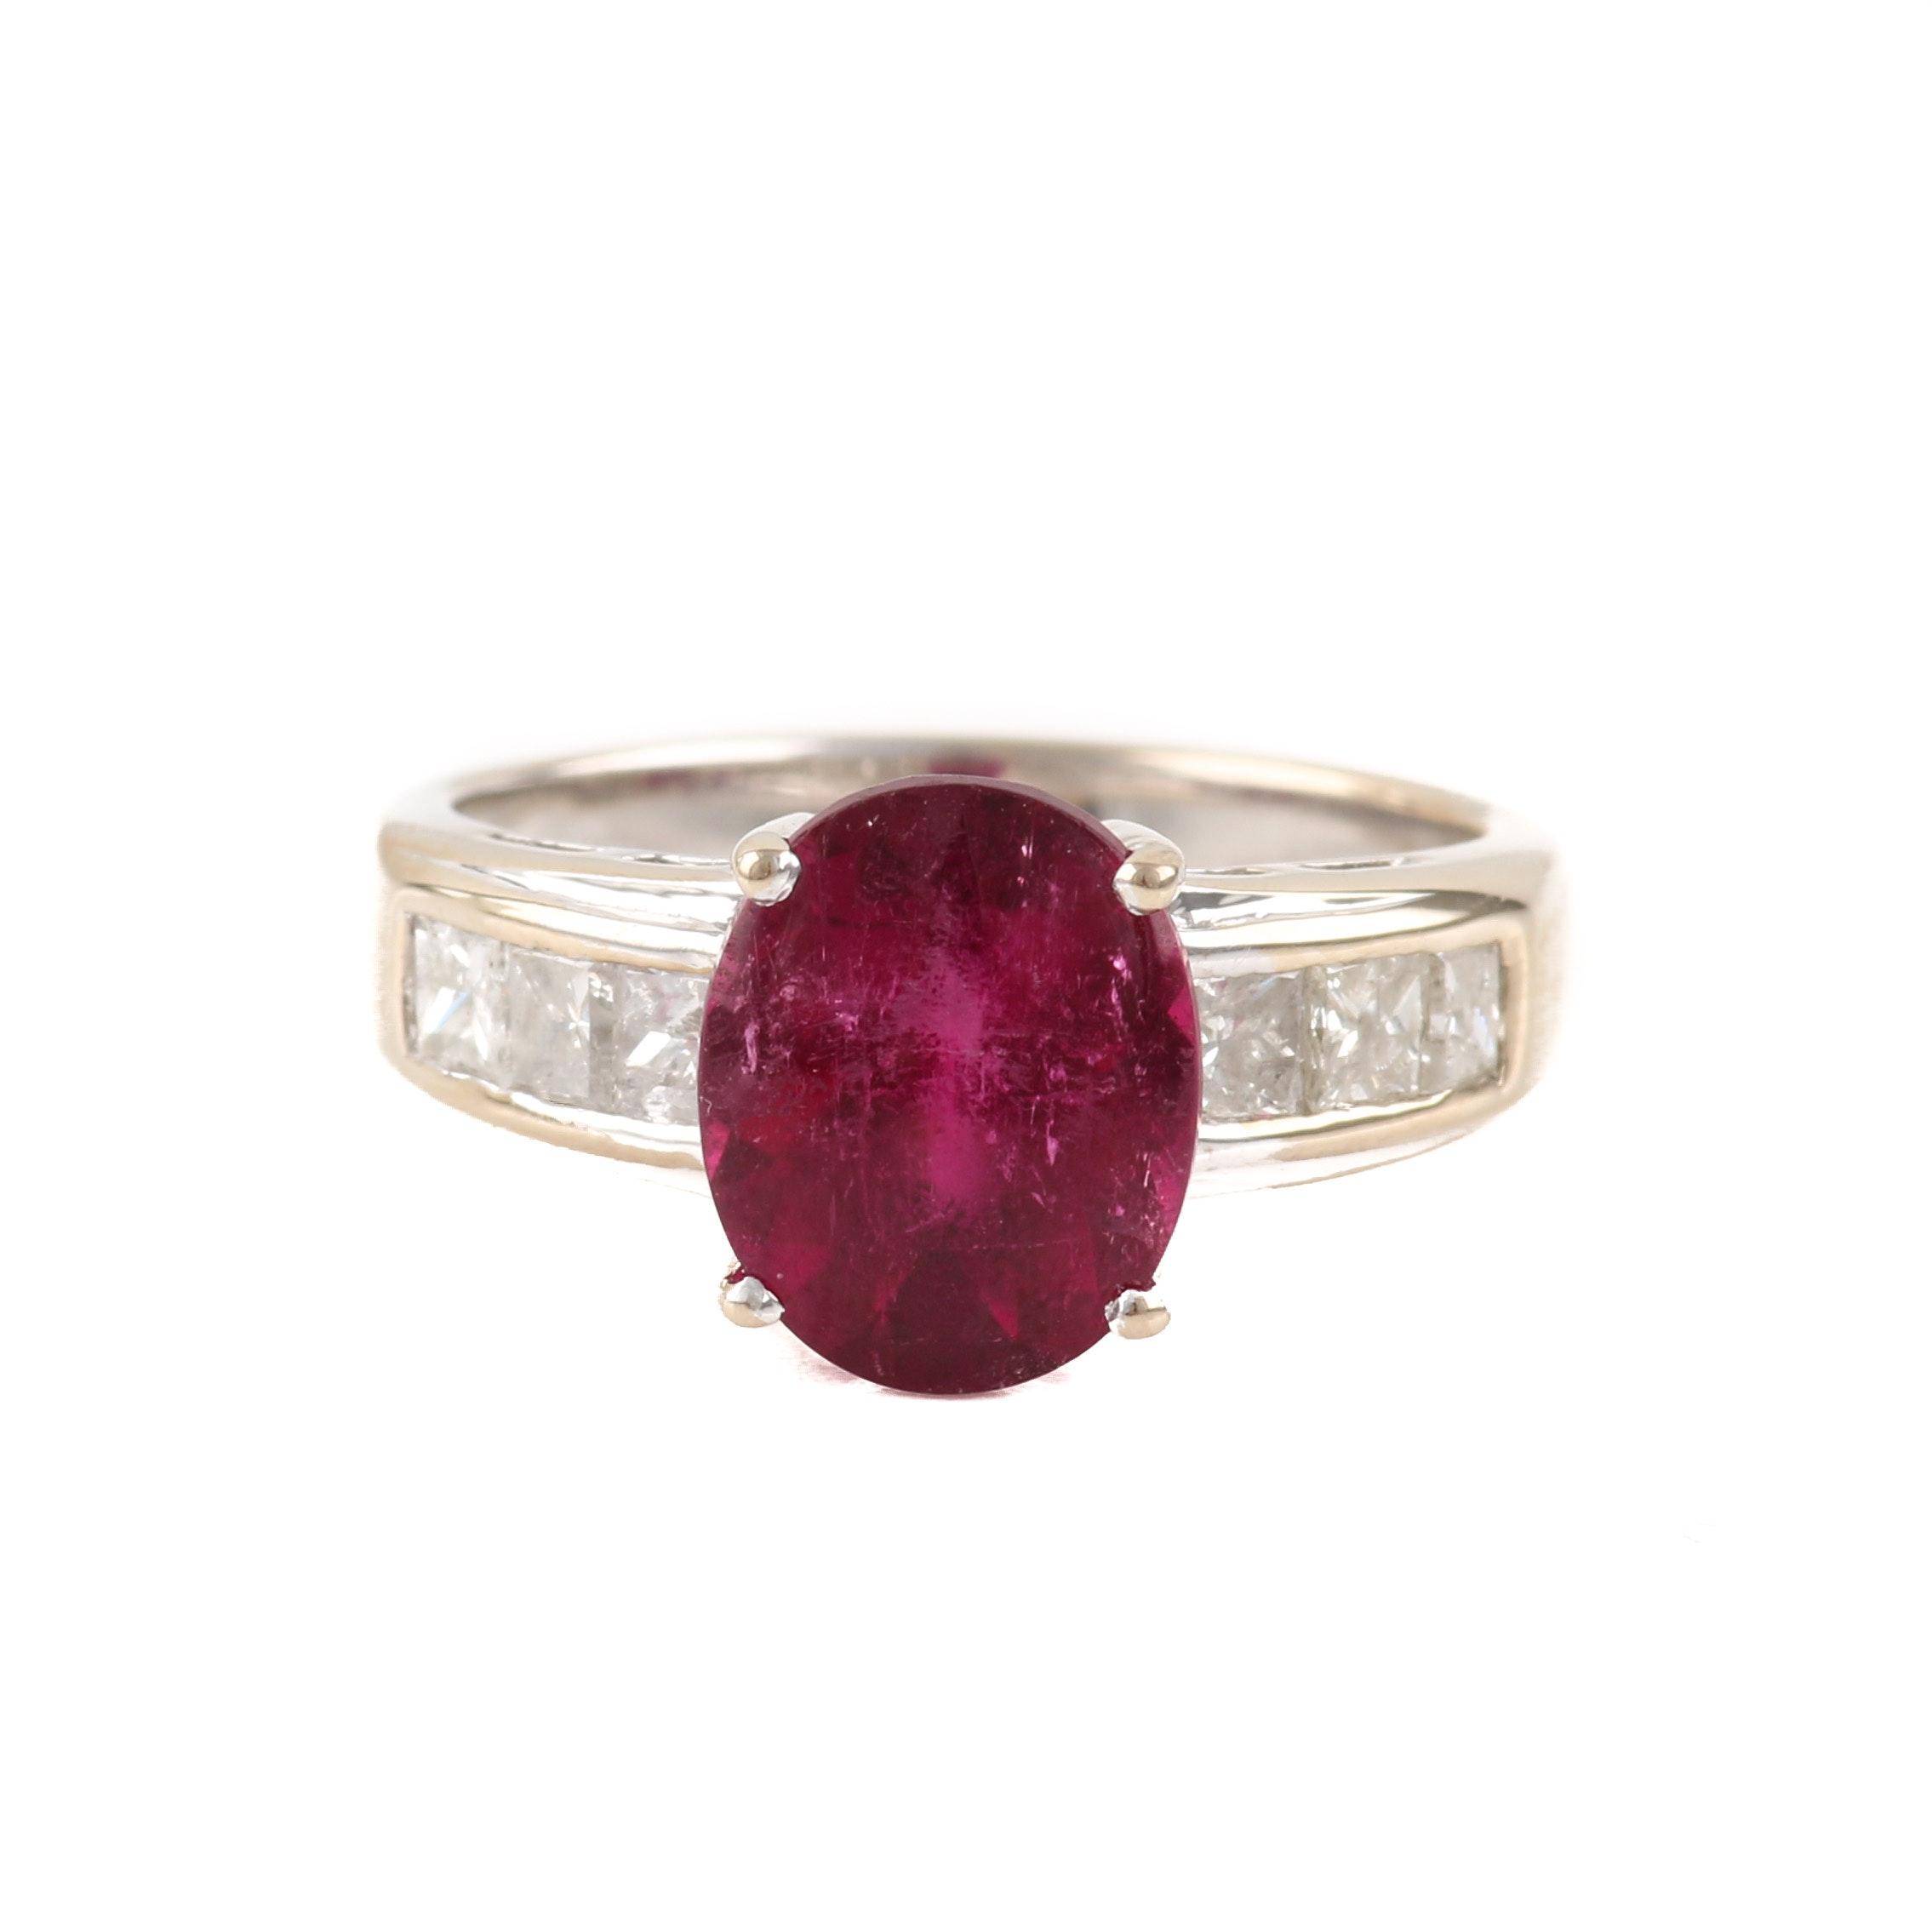 18K Yellow Gold 3.22 CT Pink Tourmaline and Diamond Ring